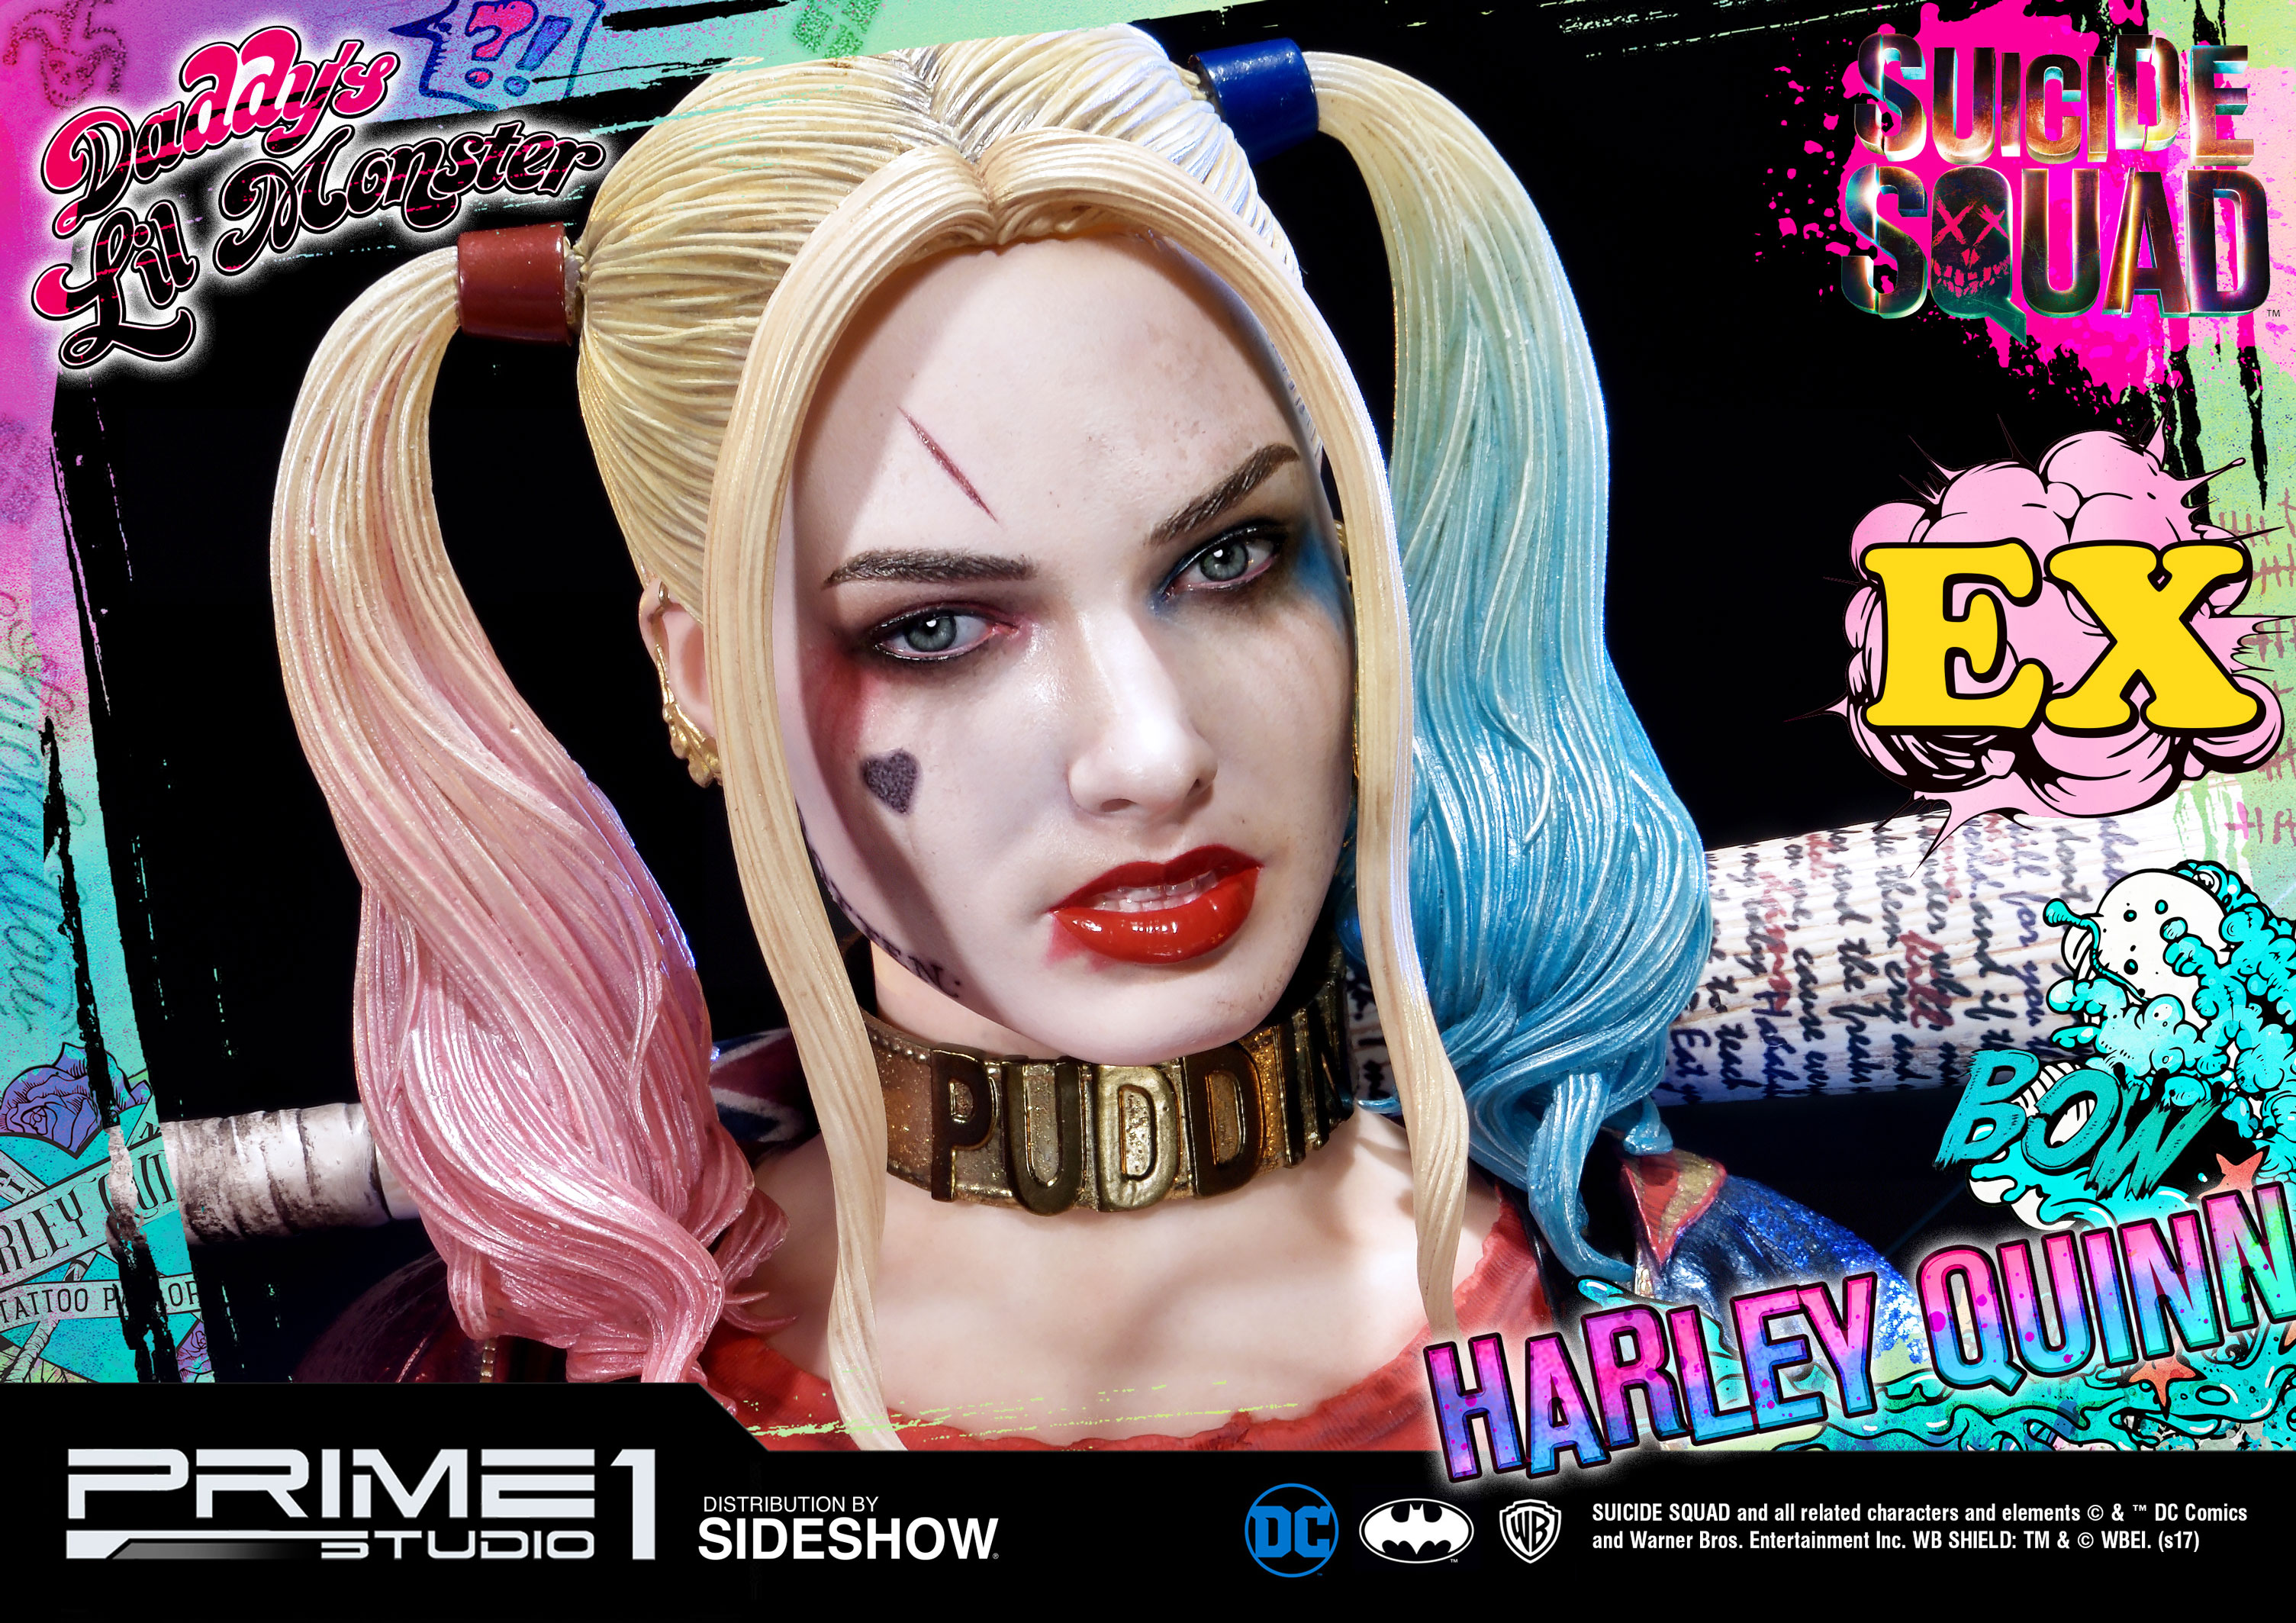 Suicid Squad Harley Quinn